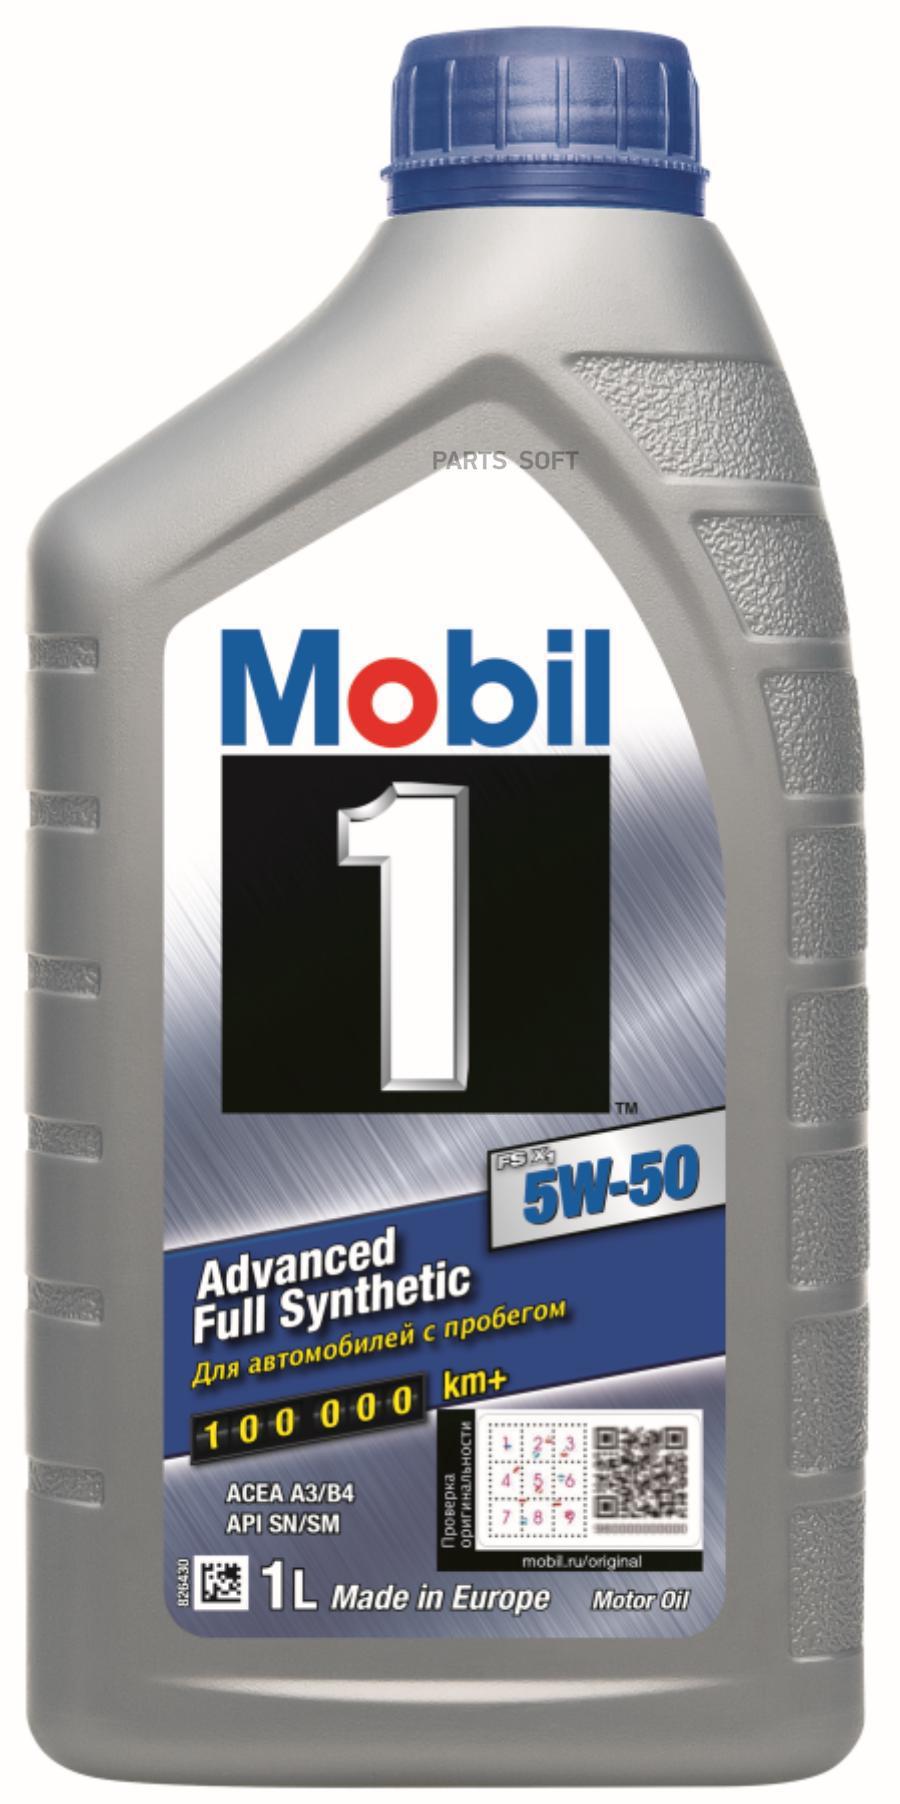 Масло моторное синтетическое Mobil 1 5W-50, 1л